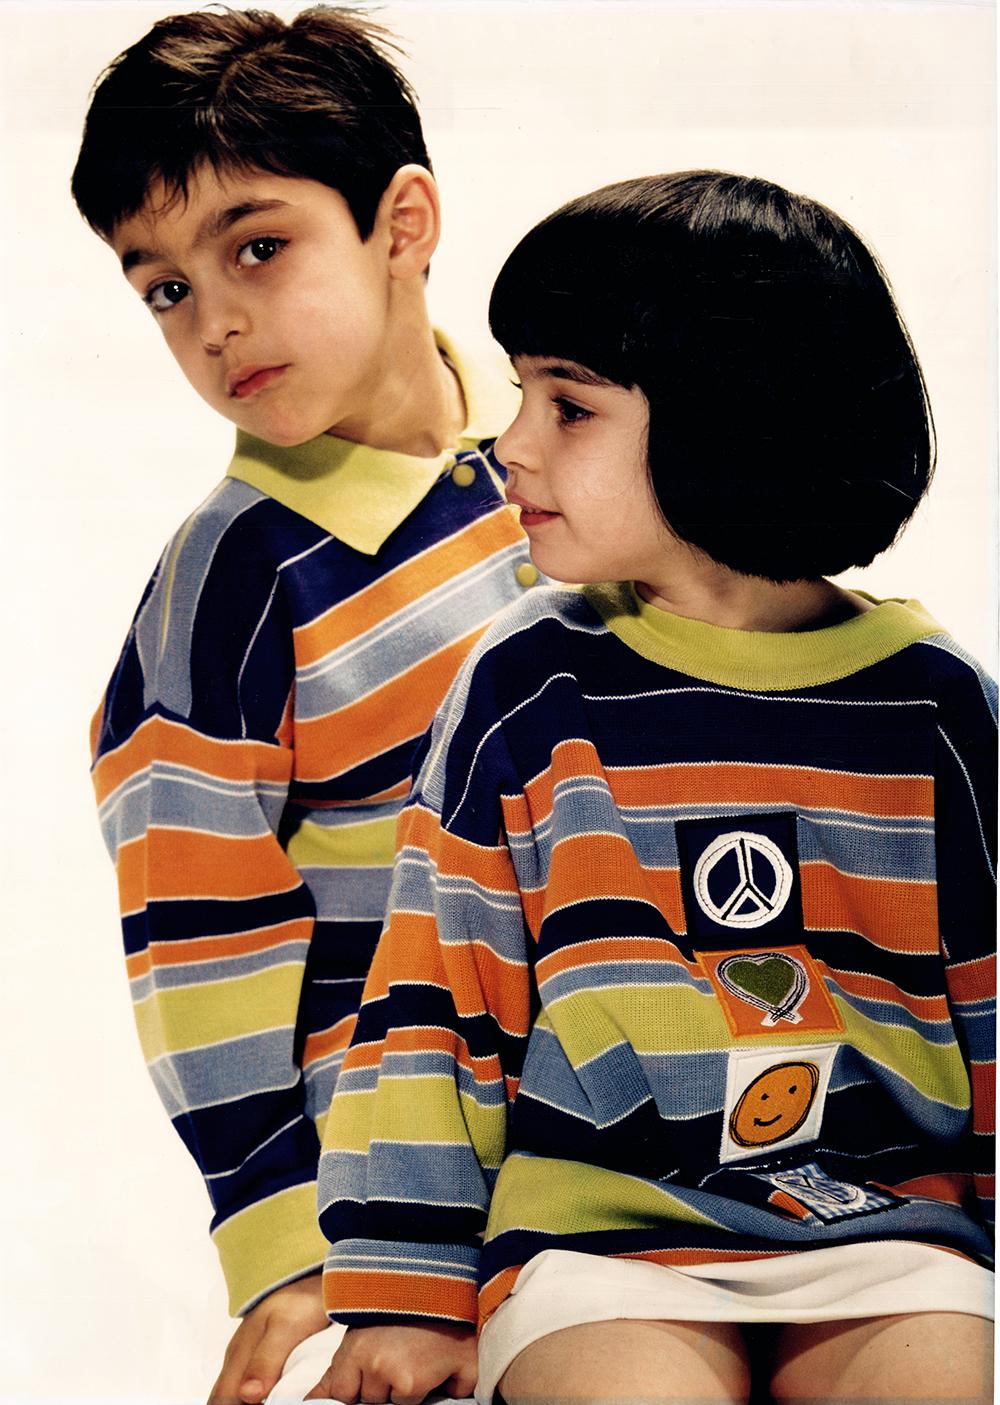 Childhood-Picture(web).jpg